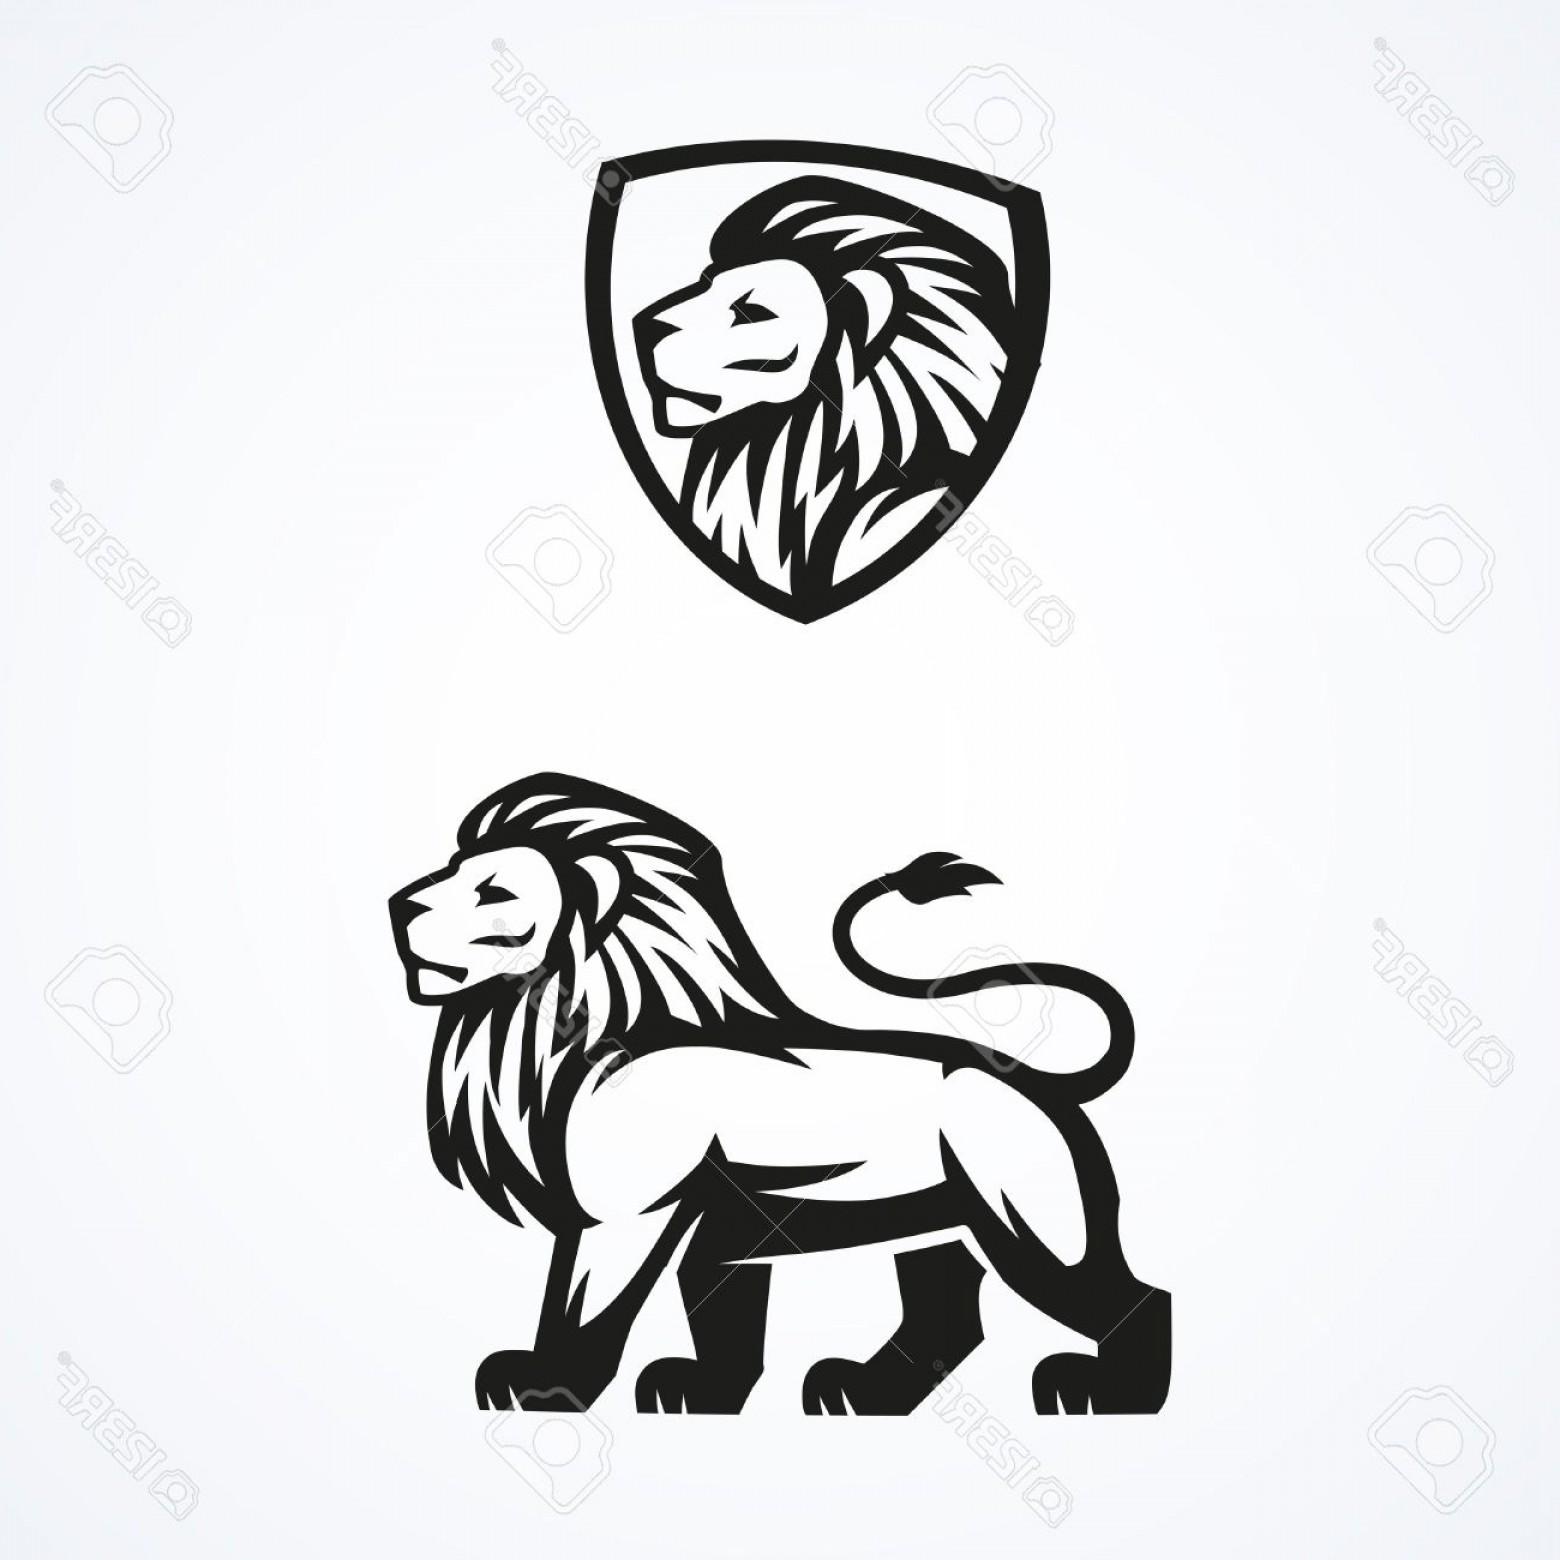 1560x1560 Photostock Vector Lion Logo Sport Mascot Emblem Vector Design